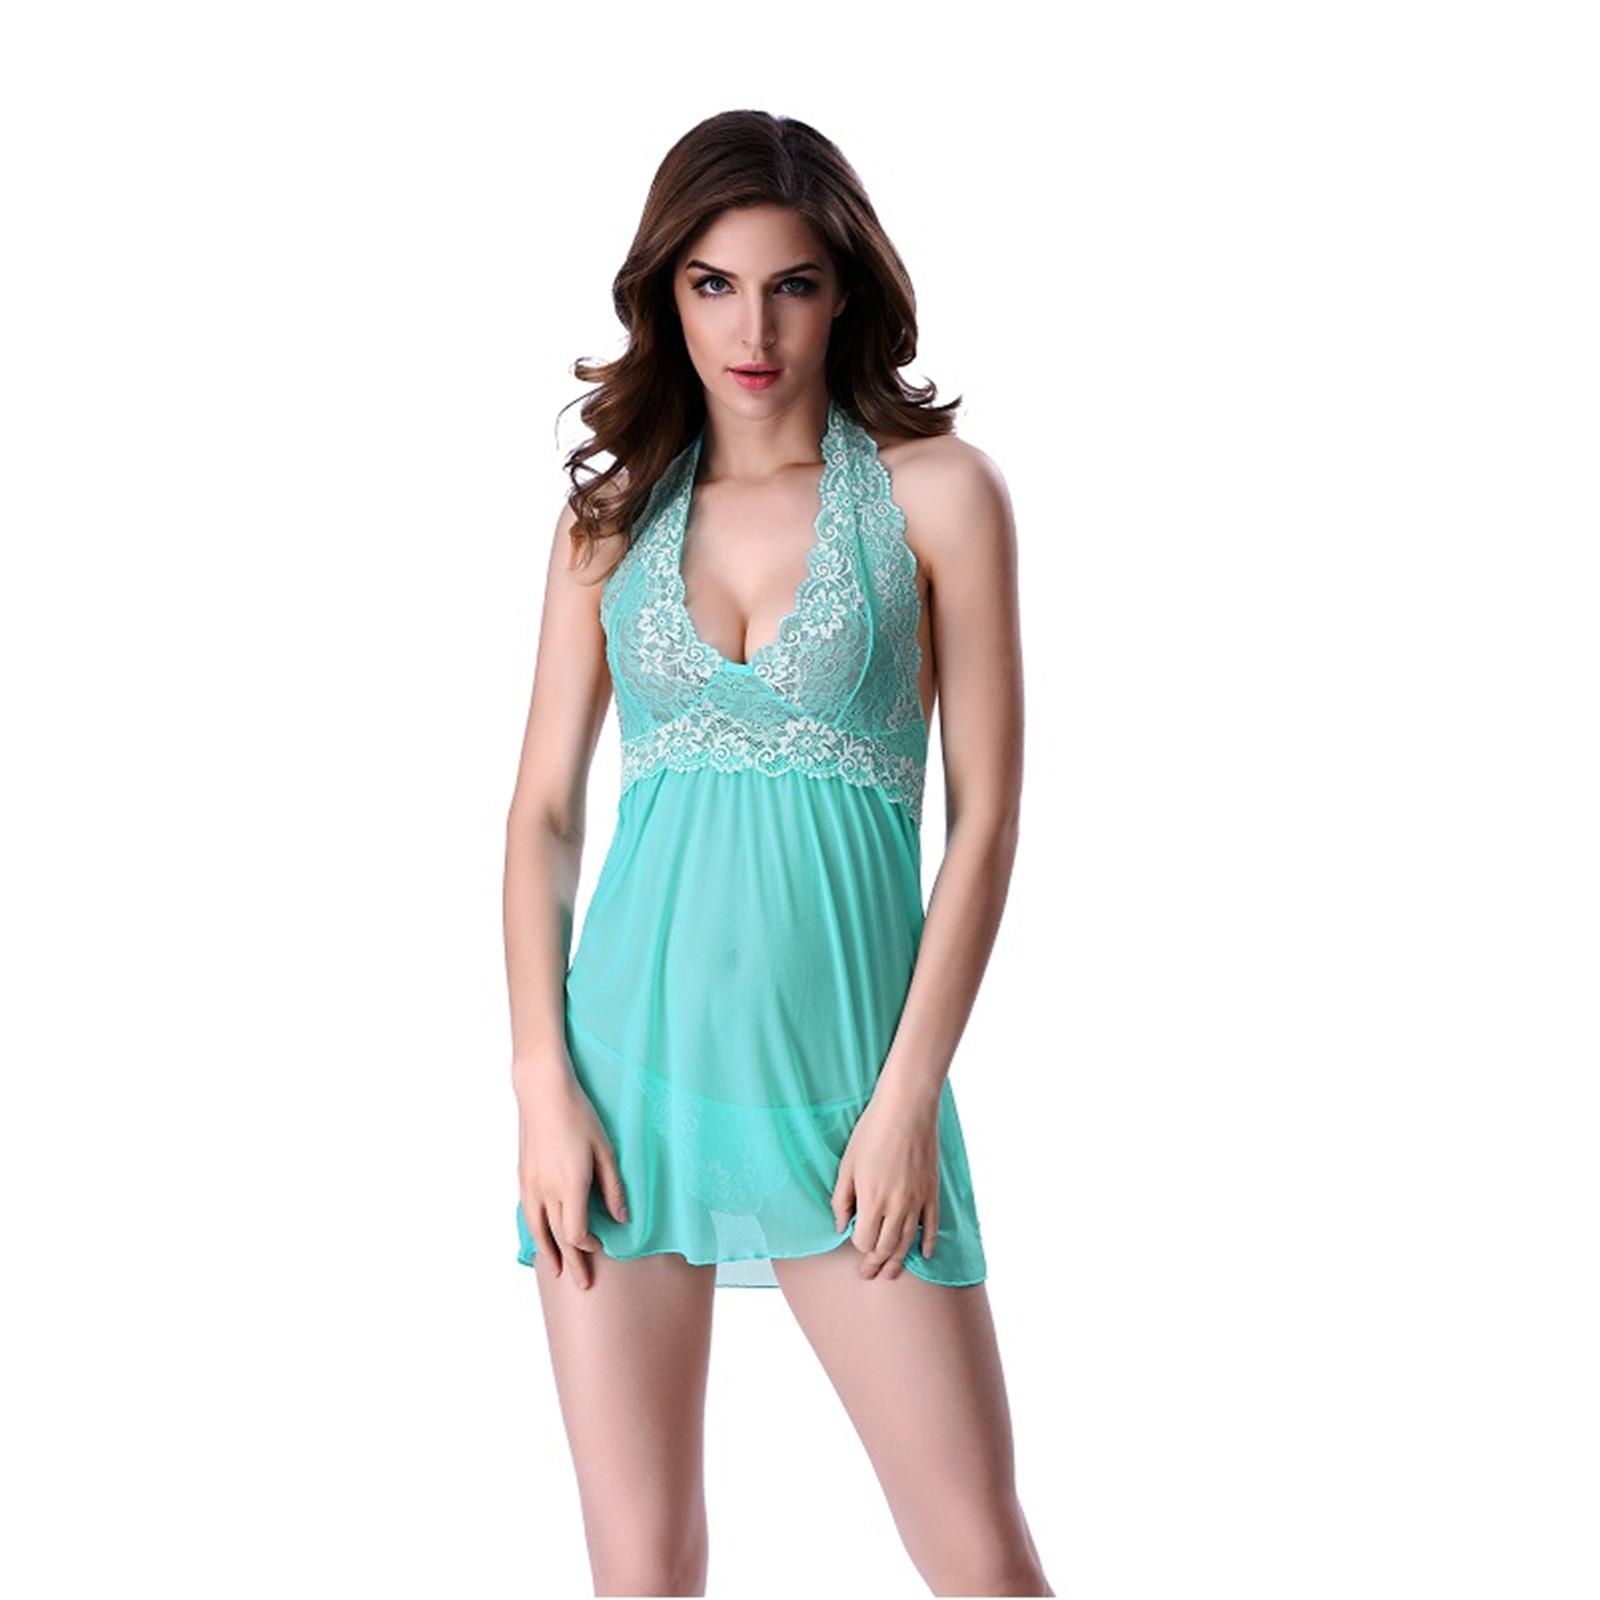 Lendgogo Sexy Lingerie Lace Skirt